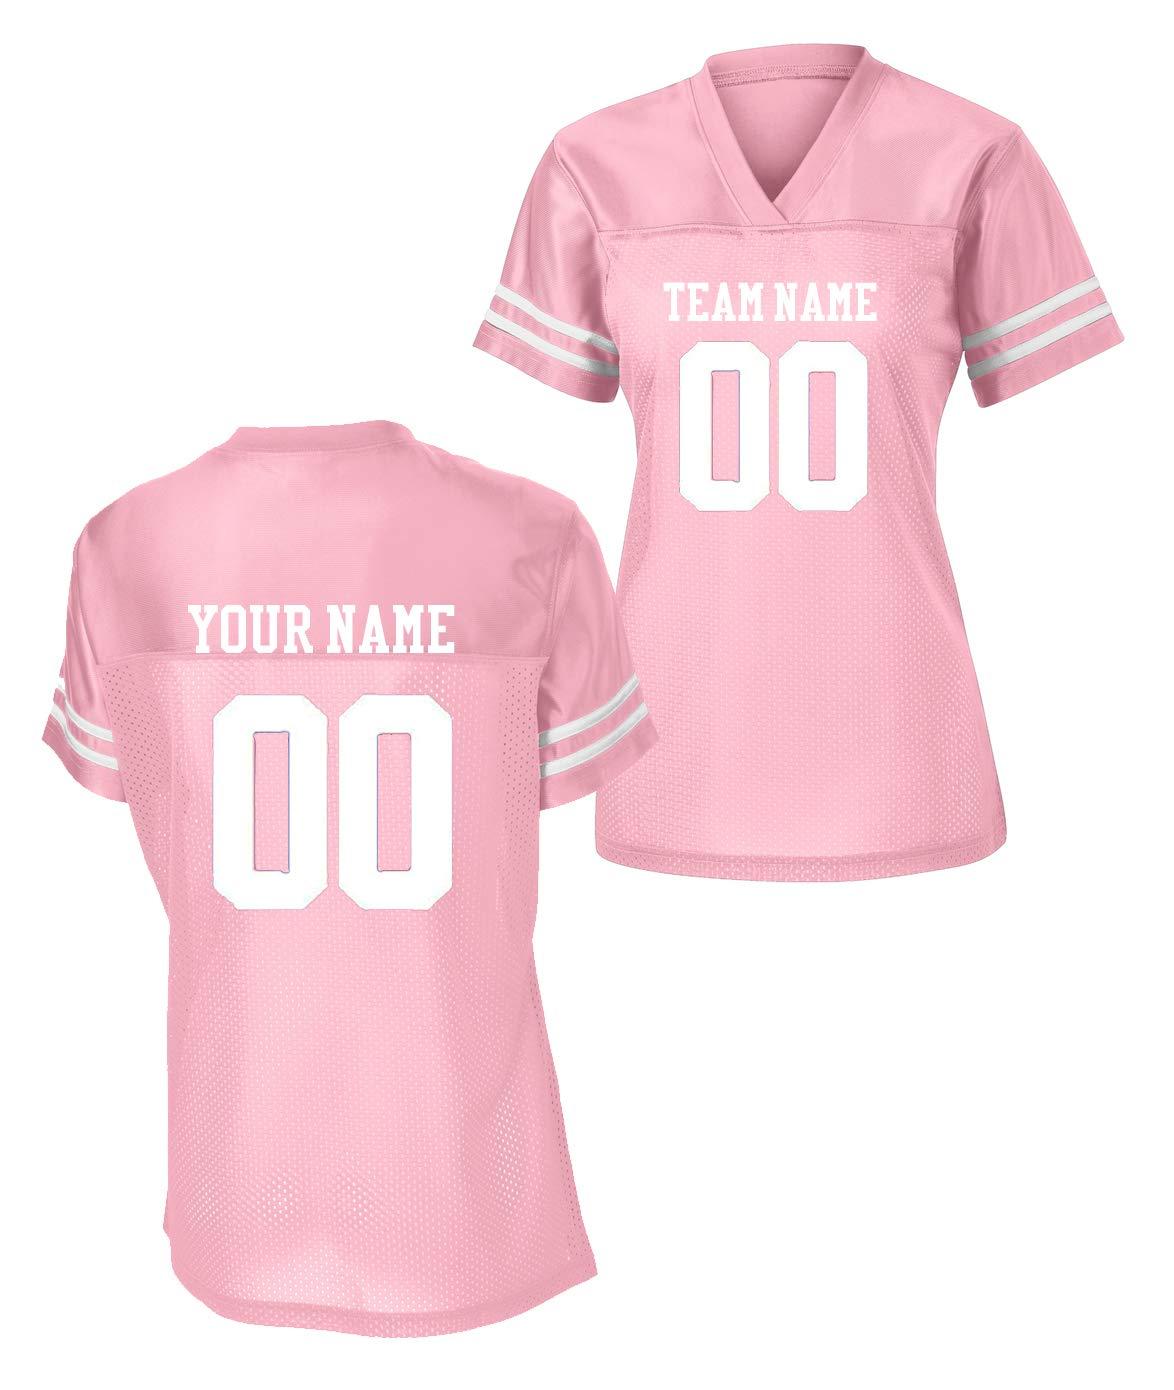 new arrival d7d47 42100 Sport-Tek Womens Custom Stadium Replica Football Jersey (Pink, Large)